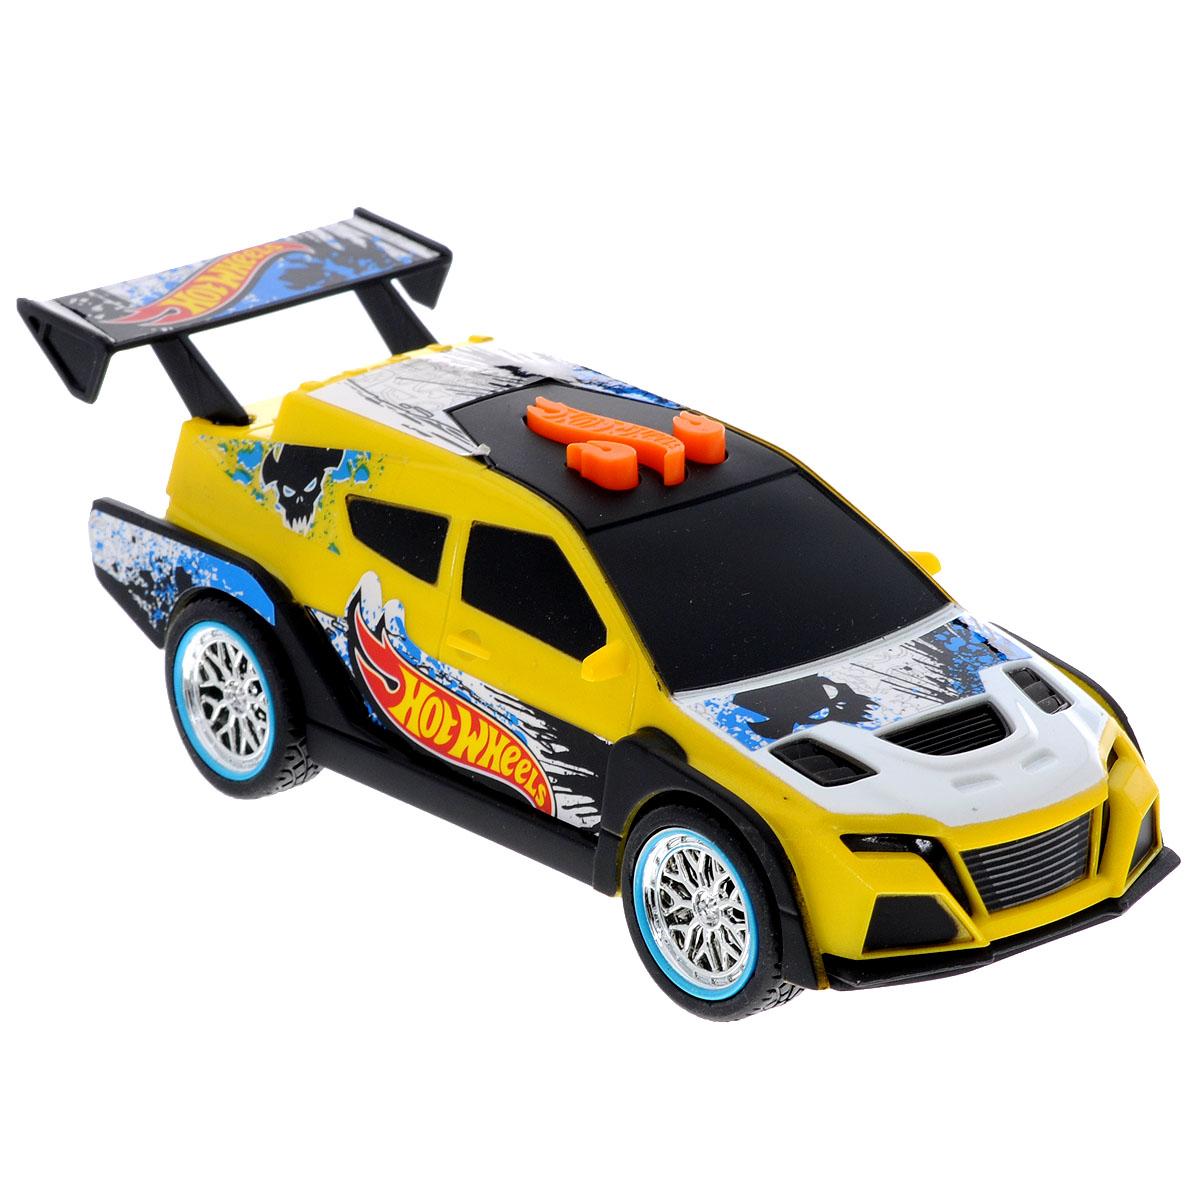 Hot Wheels Машинка Жми на газ цвет желтый